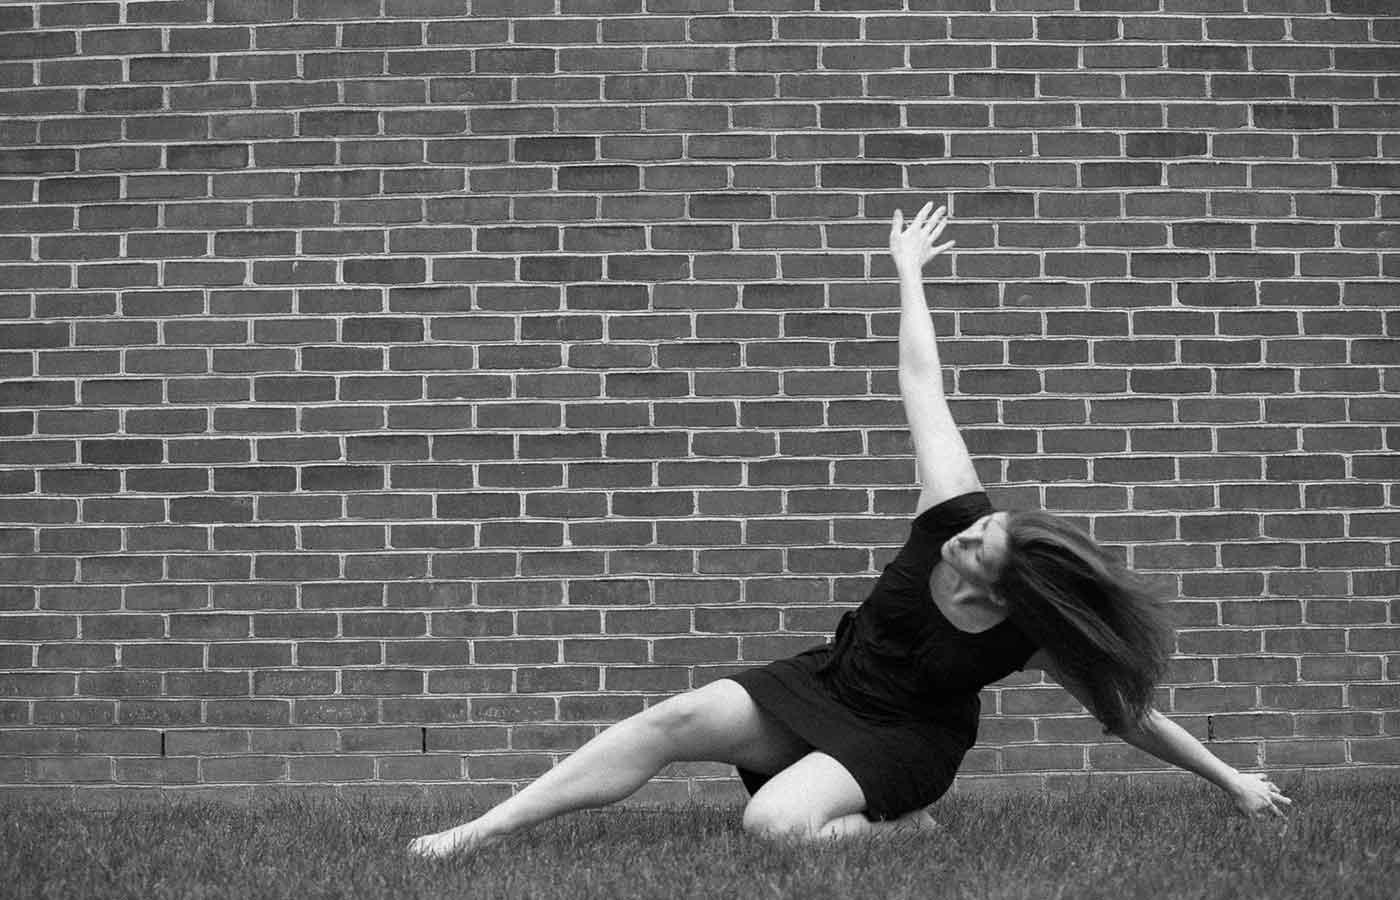 Angela Grossman dances in front of a brick wall - Marco-Calderon